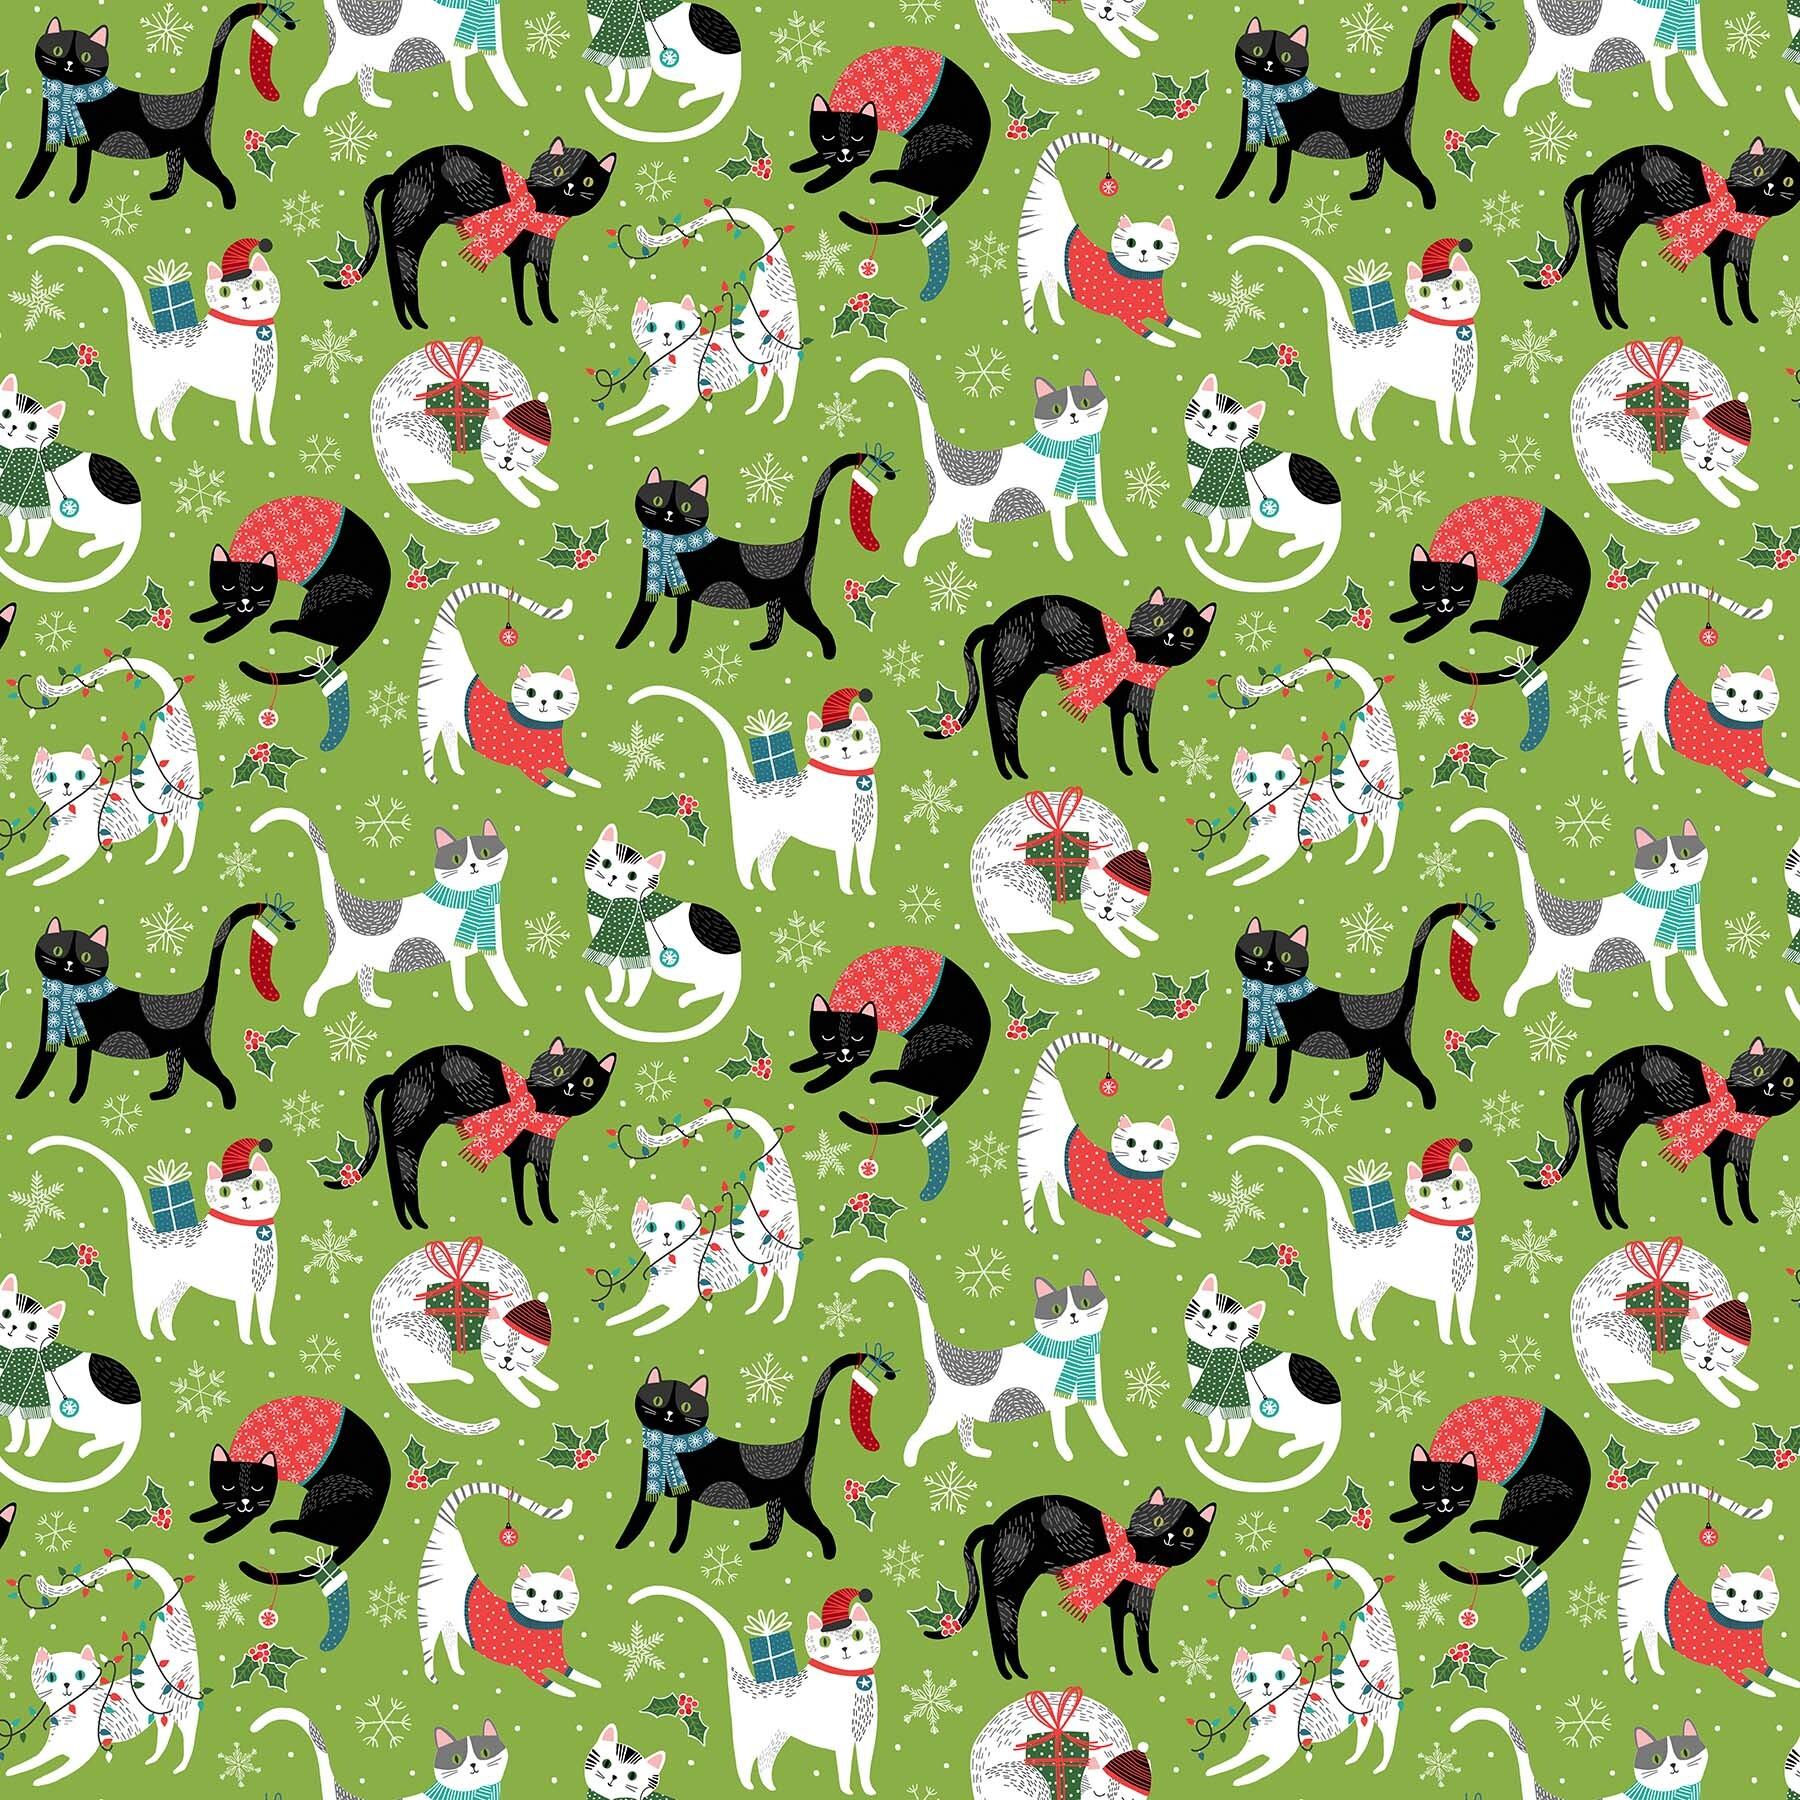 Santa Paws - Green Allover Cats - 1/2m cut 58020